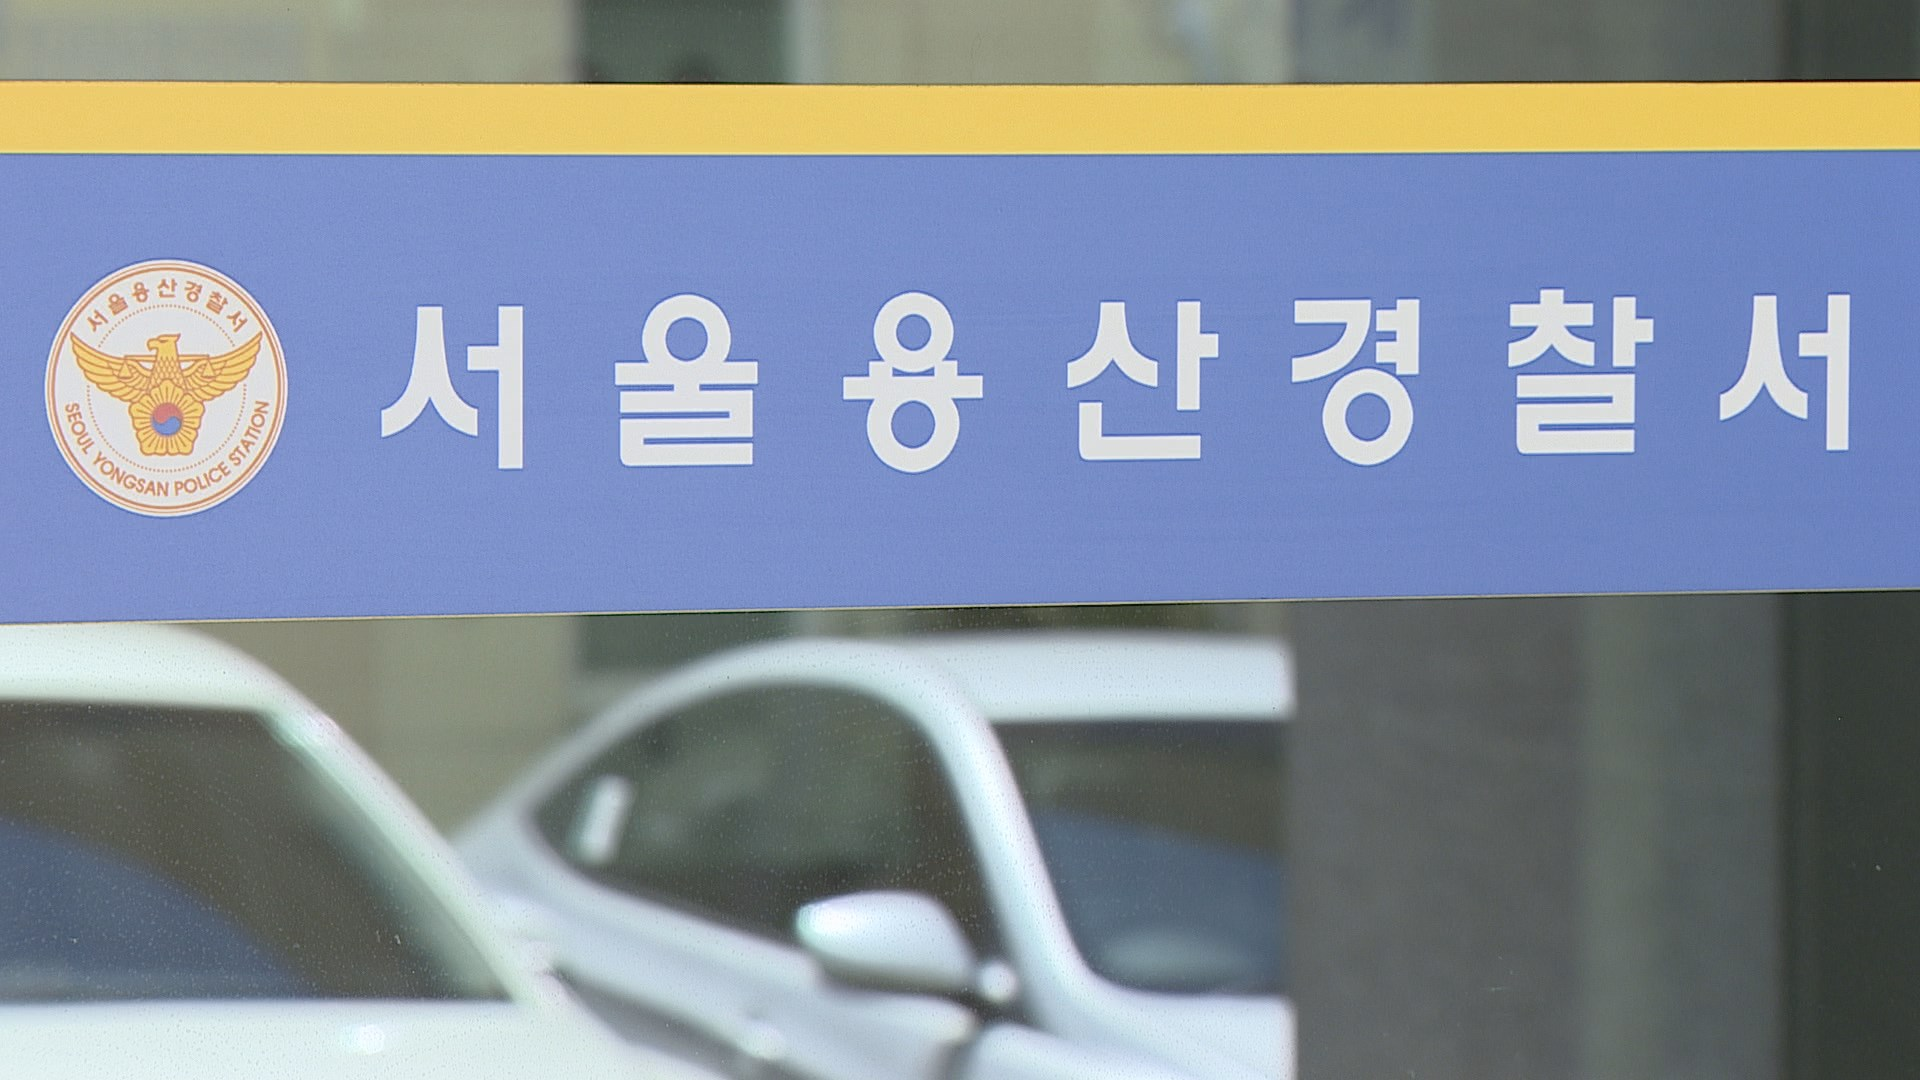 SNS에 댓글 쓴 후배 <em class='find'>폭행</em> 30대 래퍼 송치